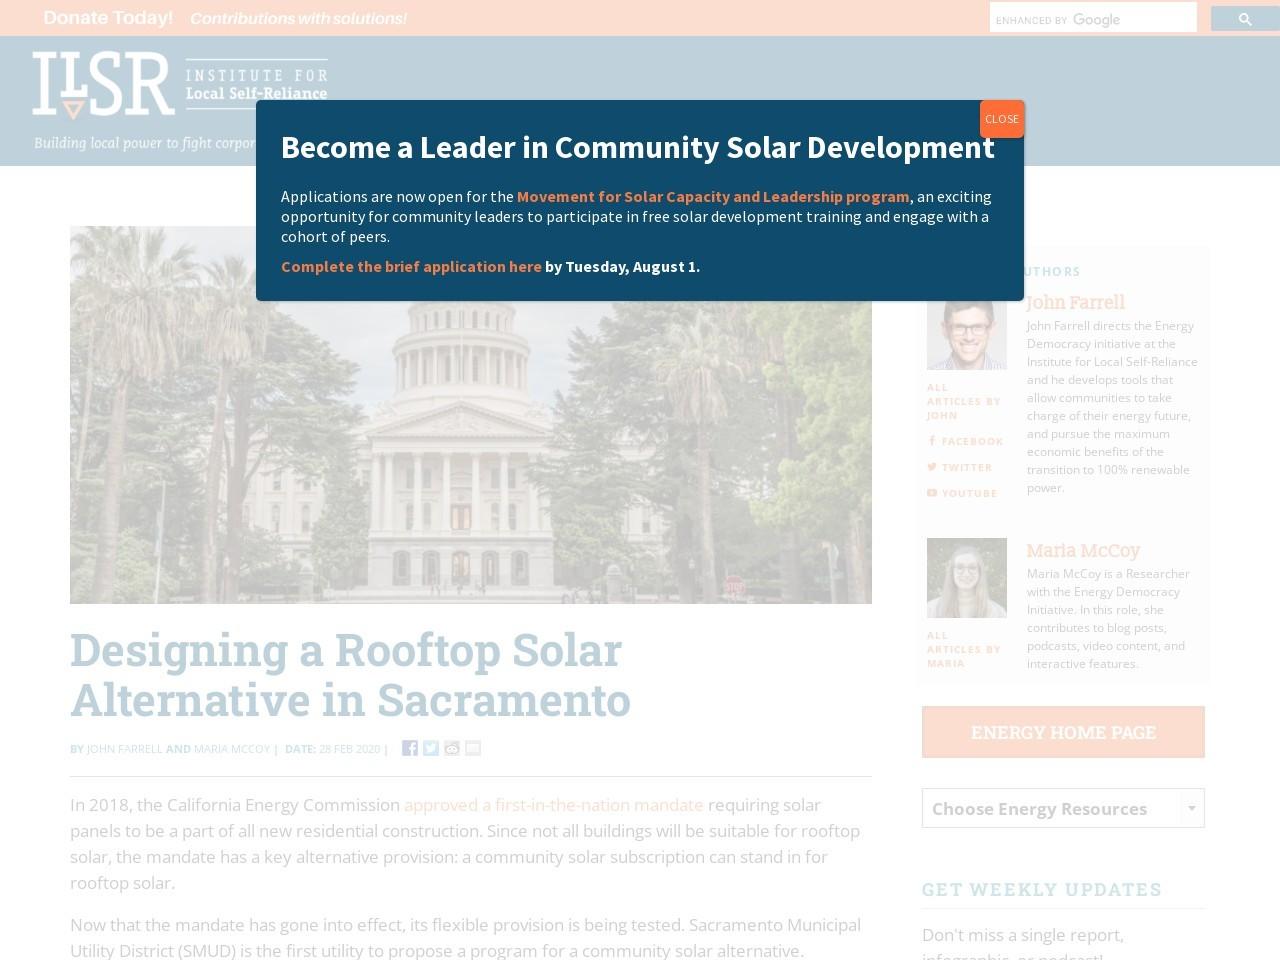 Designing a Rooftop Solar Alternative in Sacramento